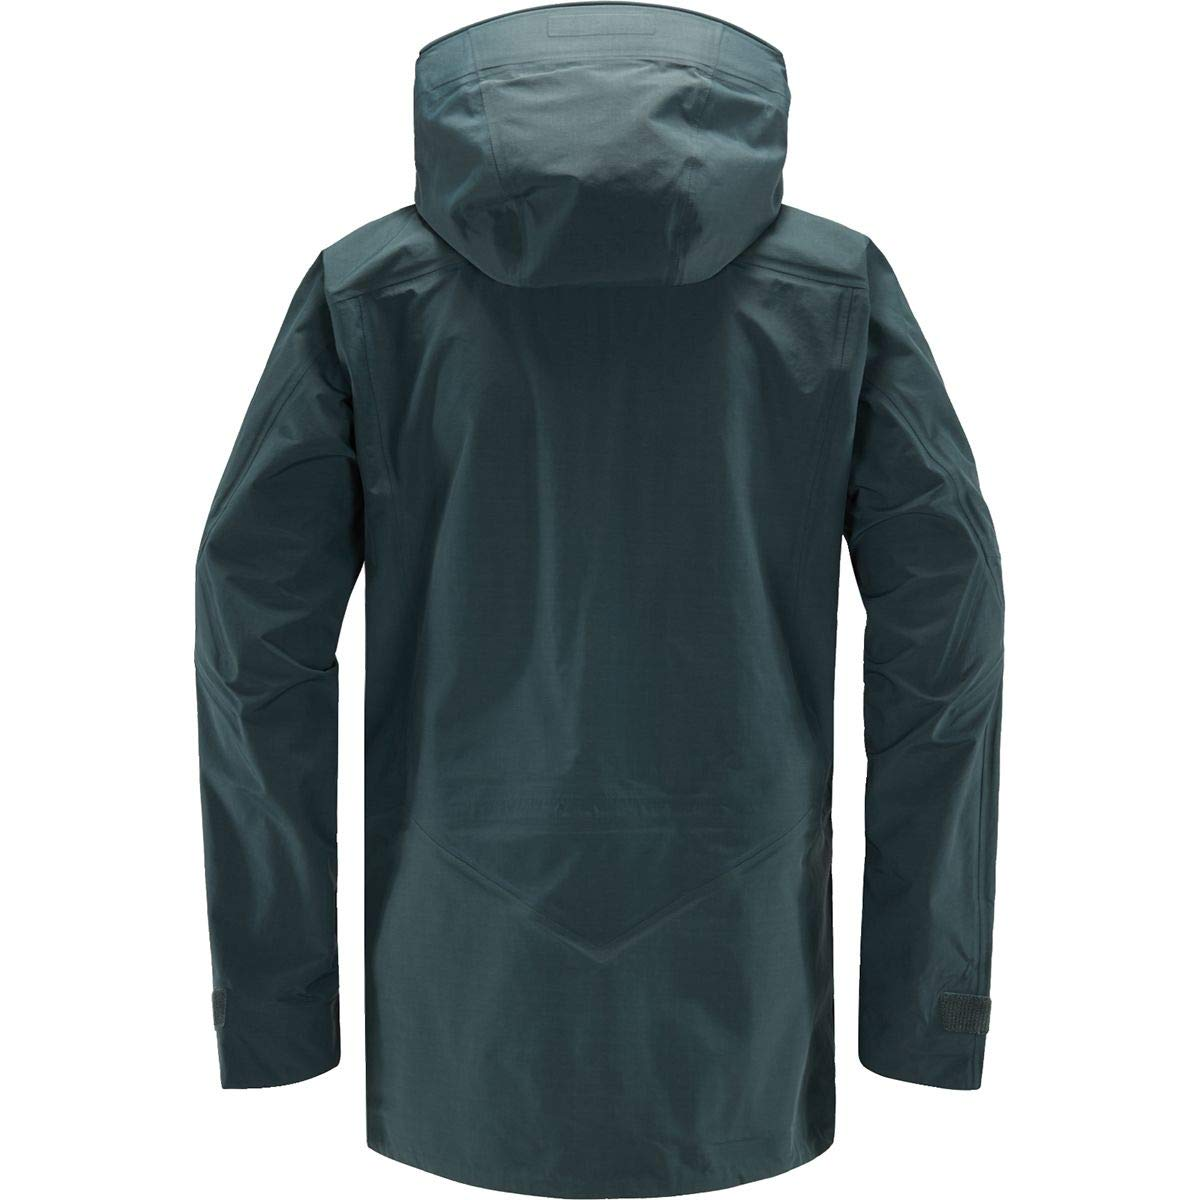 Haglofs Nengal 3L Proof Parka Snow Jacket